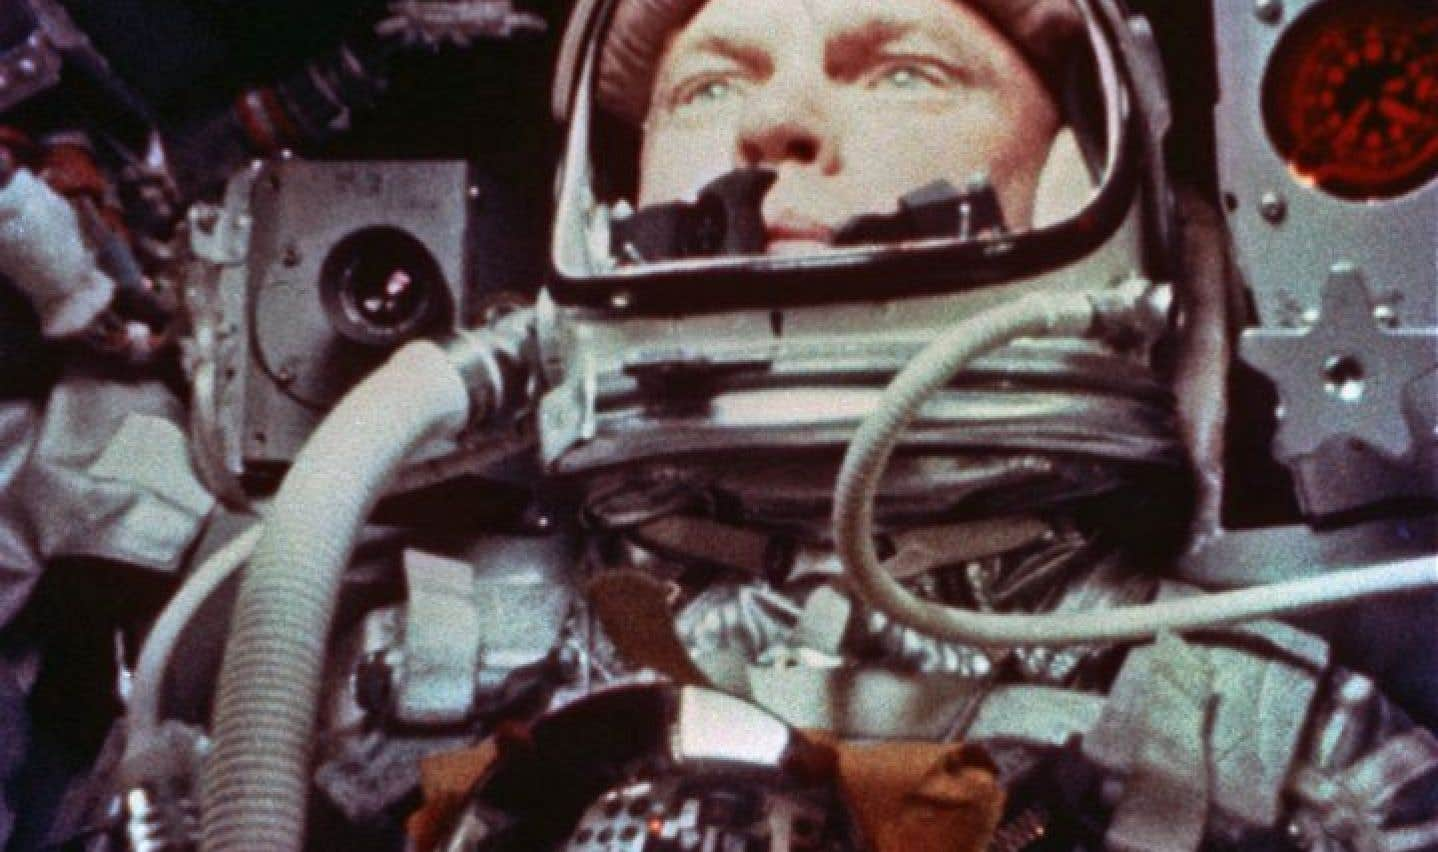 L'ancien astronaute John Glenn a rejoint les étoiles